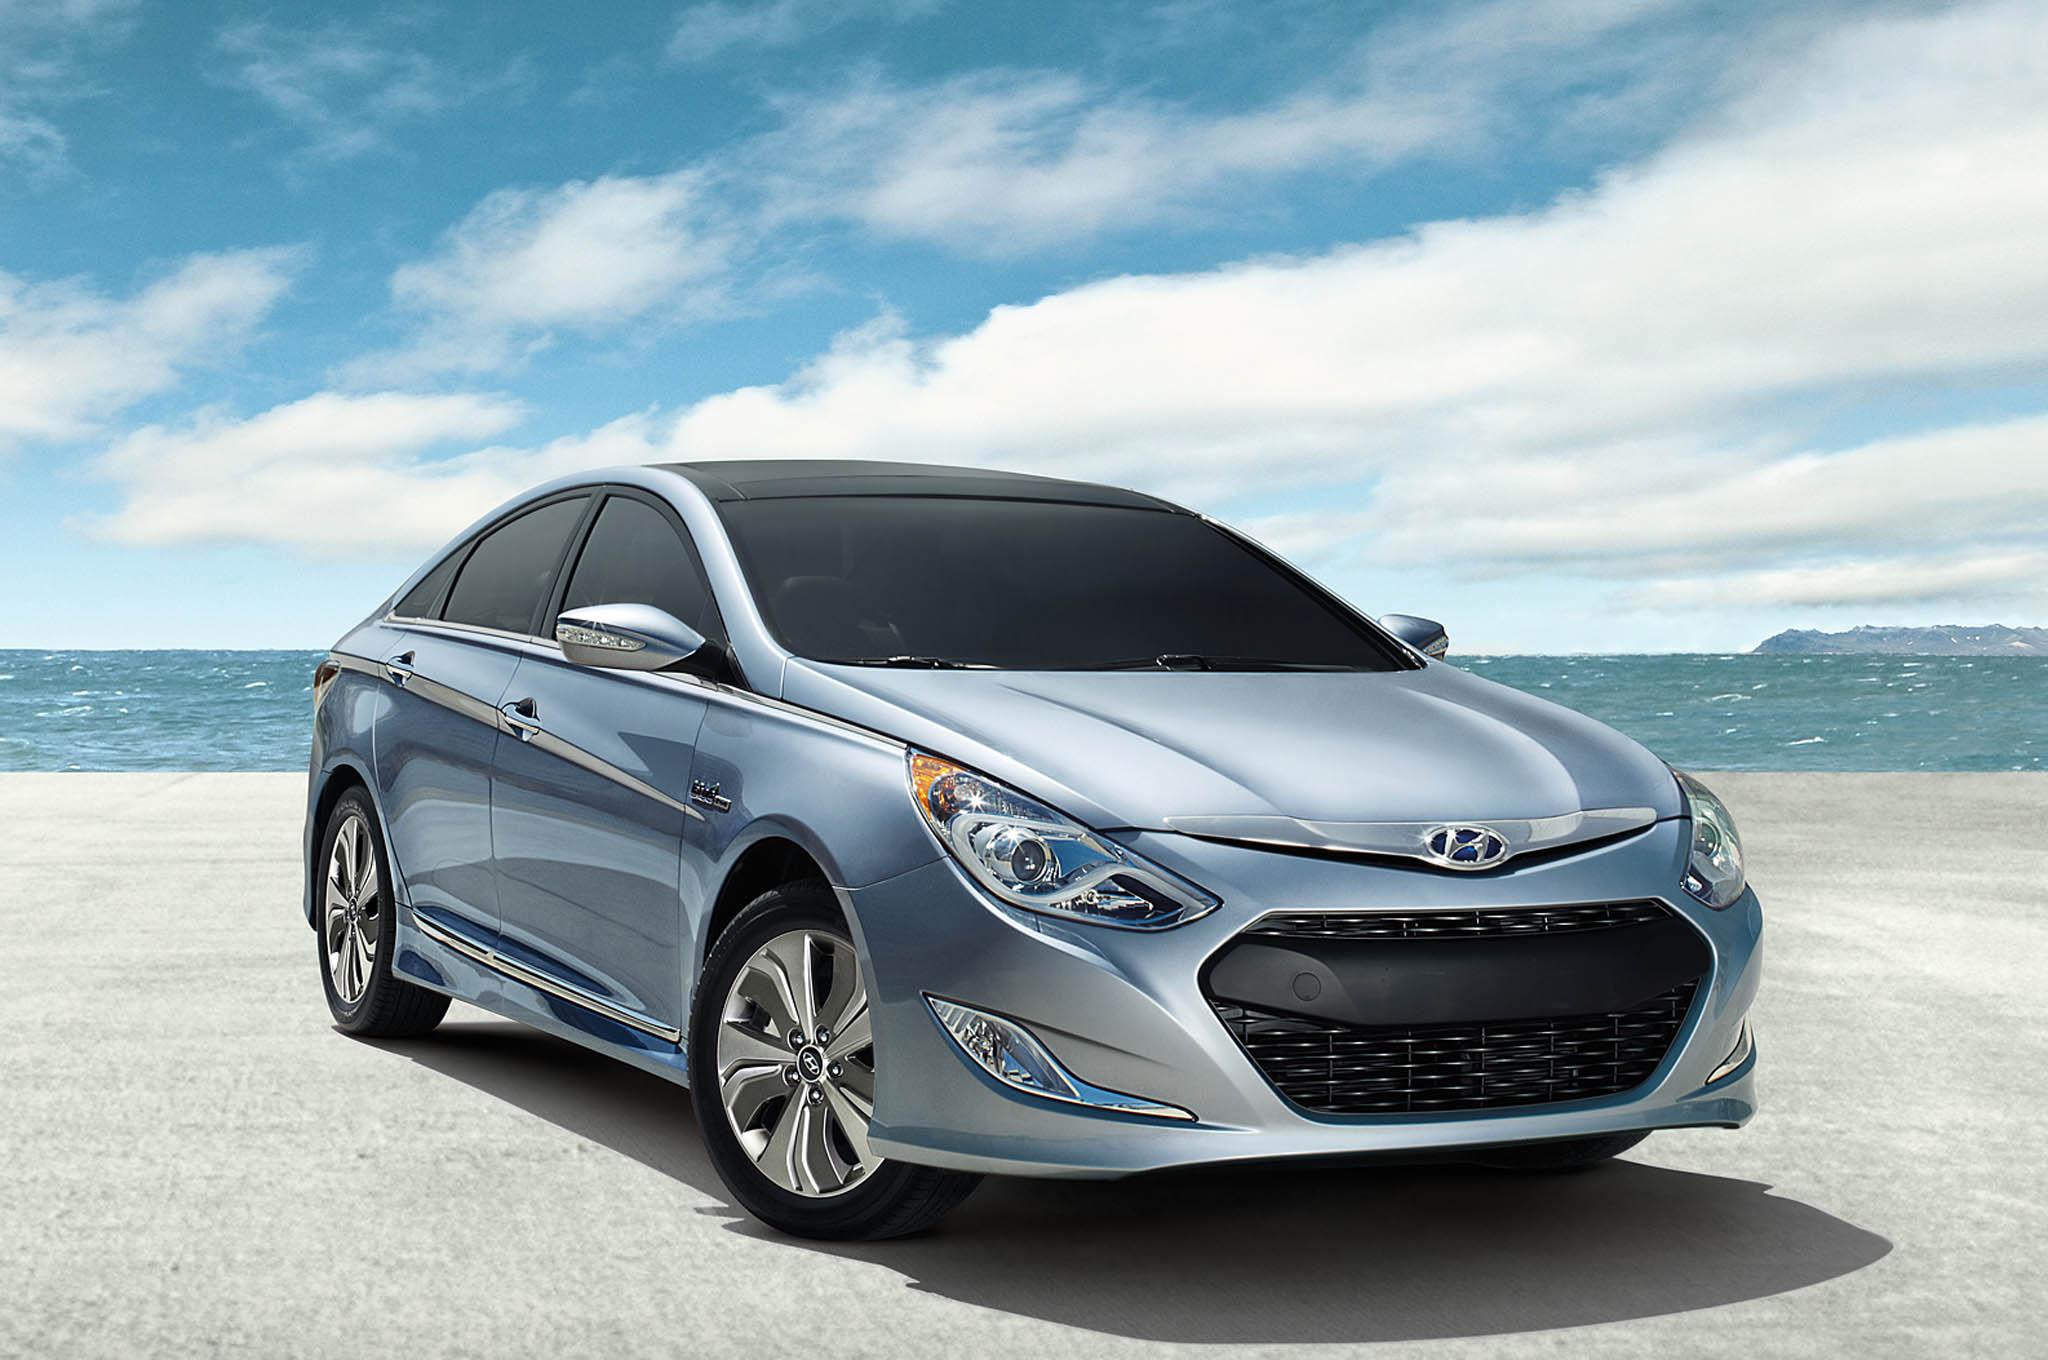 2013 Hyundai Sonata Hybrid Exterior Front 34 Sky1